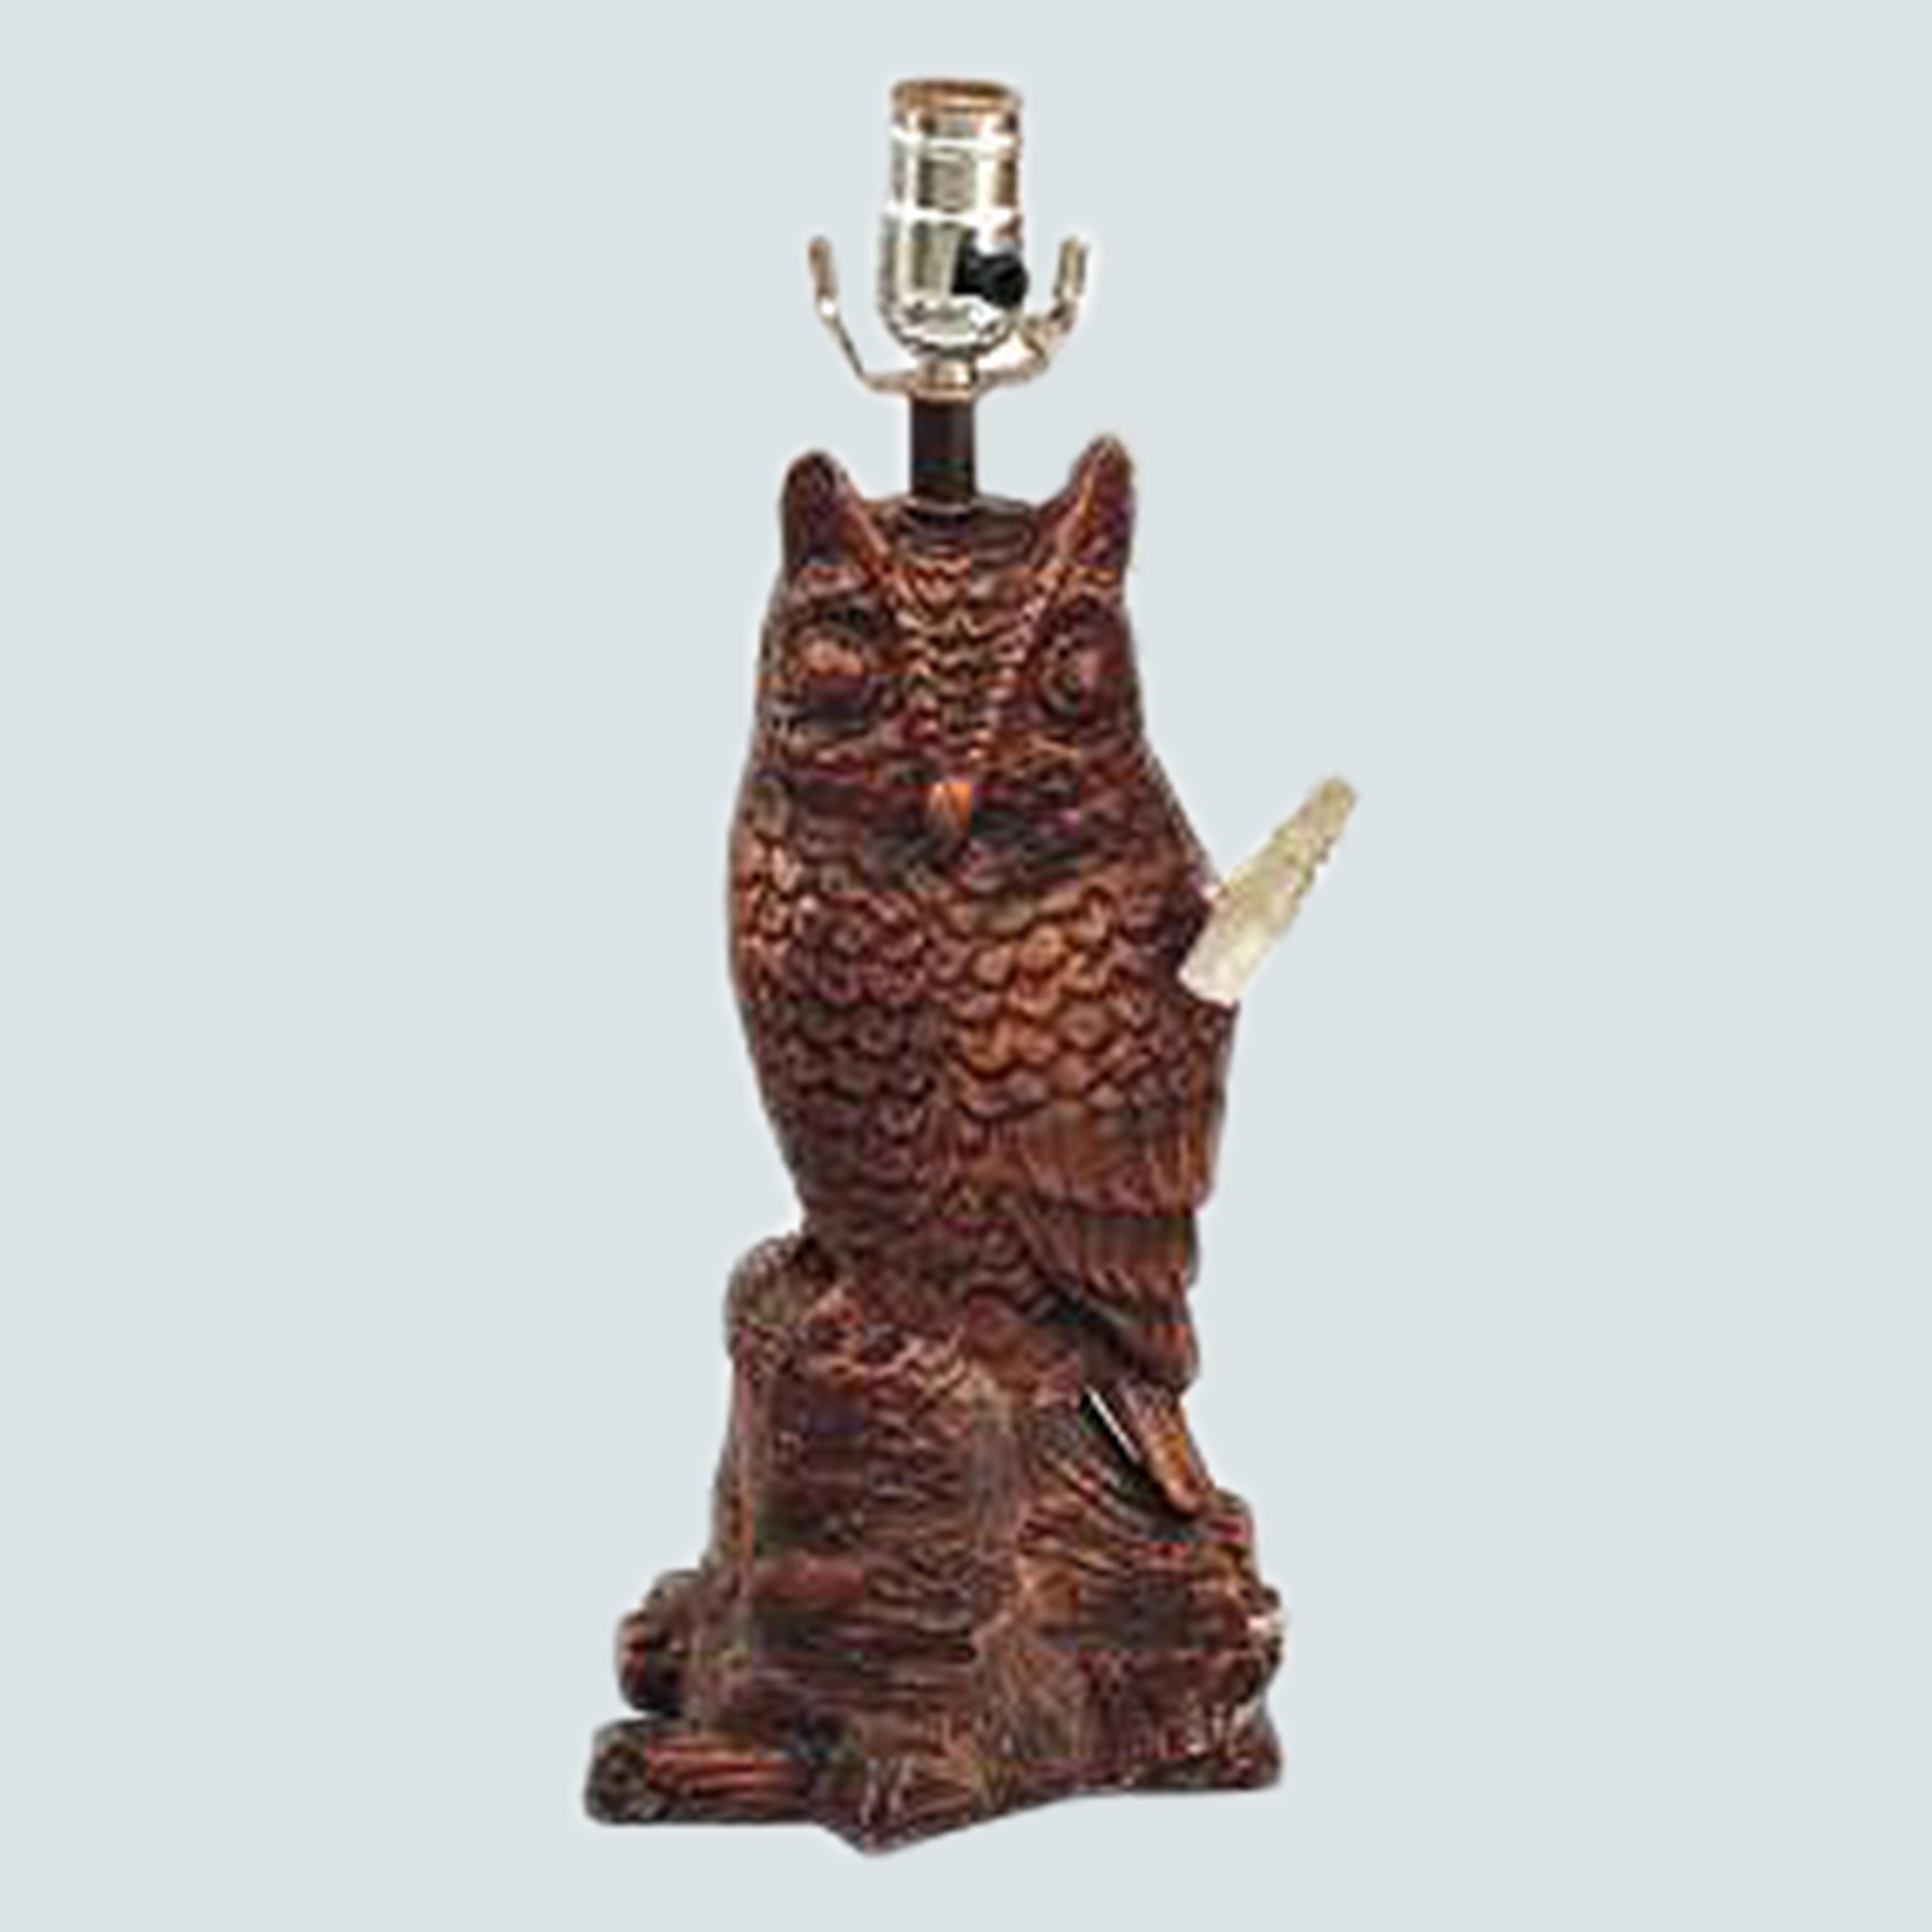 Owl Lightning- Desgner - Table Lightning - Traditional Table Lamp Carved Brown/golden for Living Room Family Bedroom Bedside Nightstand - Metal- Aluminium